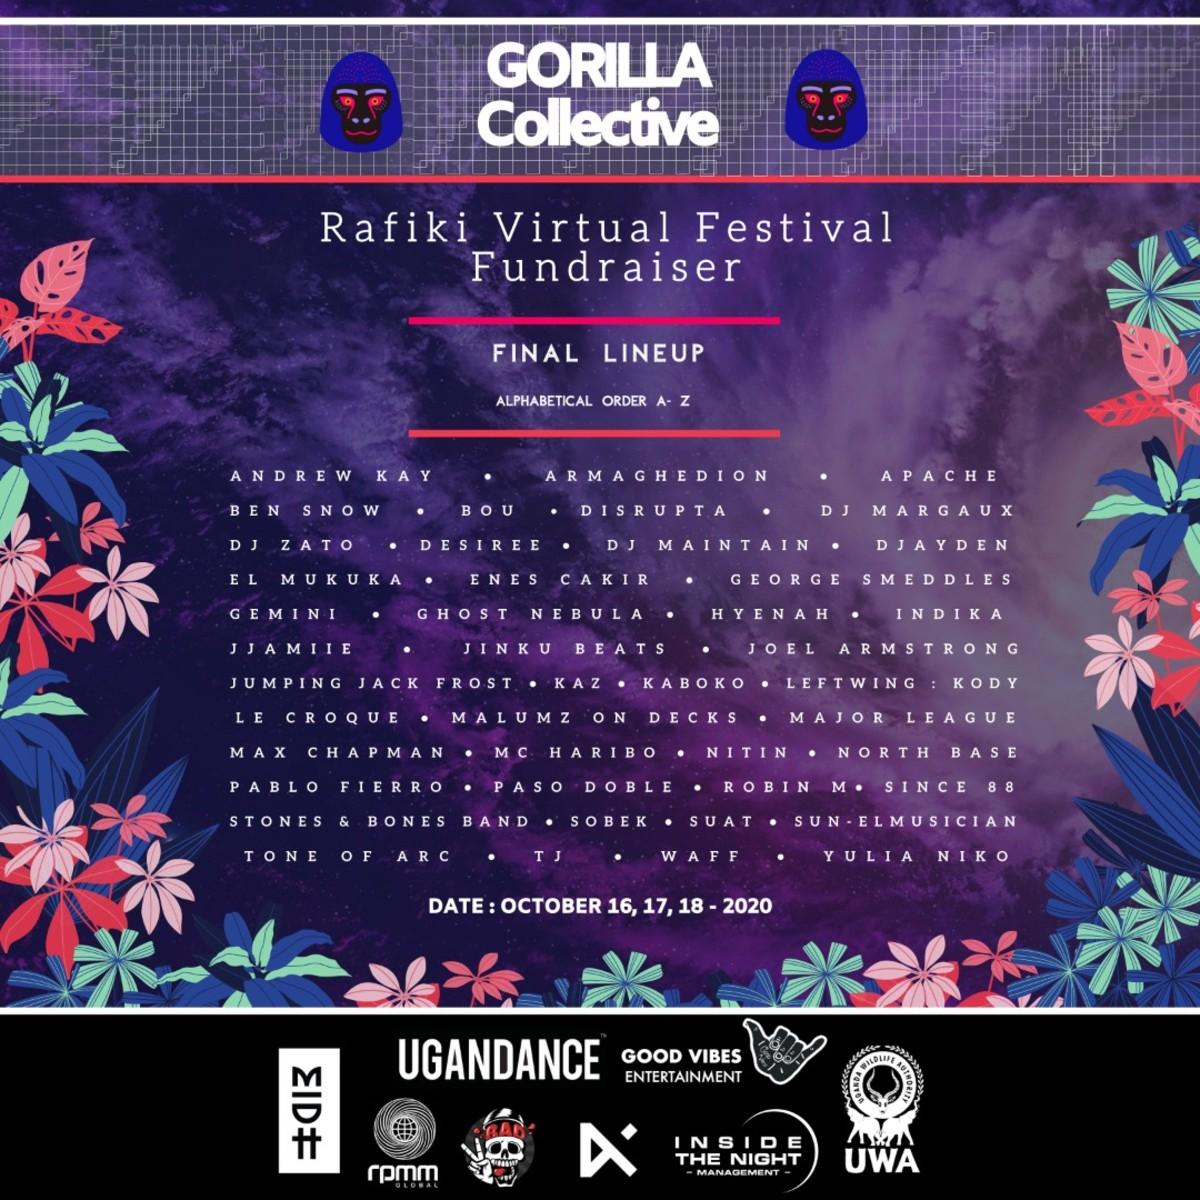 Rafiki Virtual Festival Fundraiser